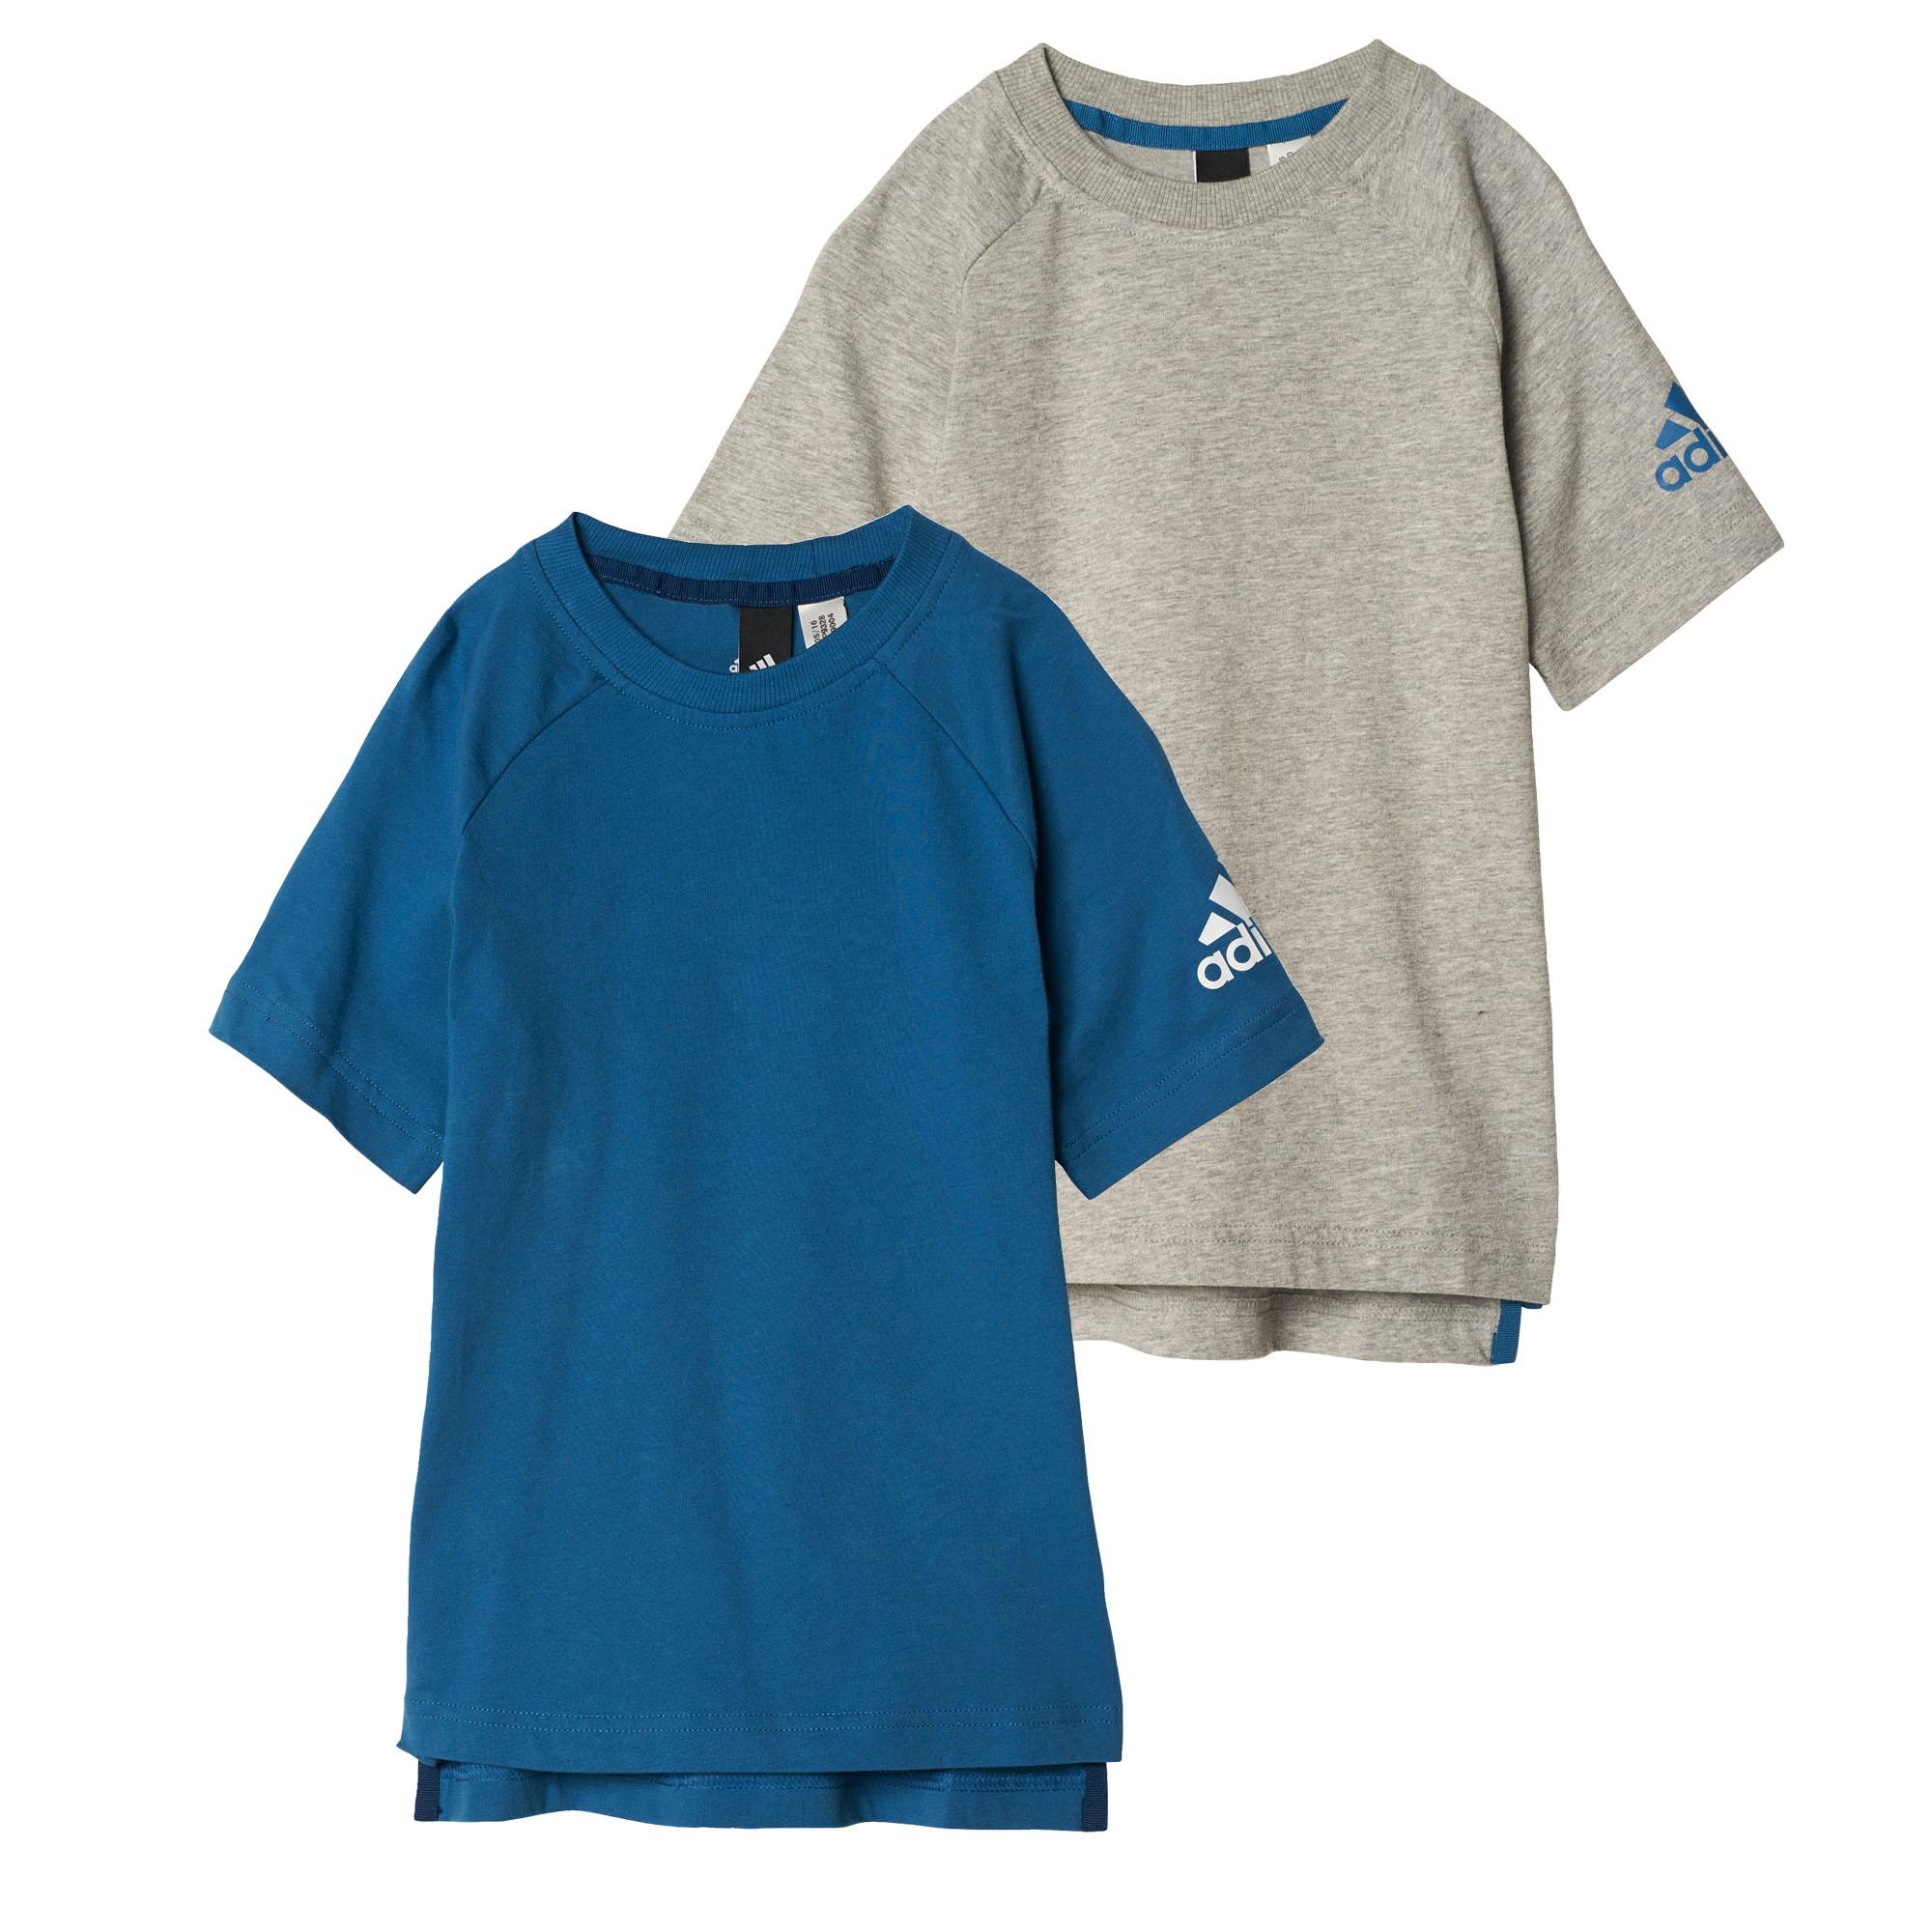 fab52cb85 adidas Little Boys Logo Kids Cotton T-Shirt Grey - 5-6 Years ...